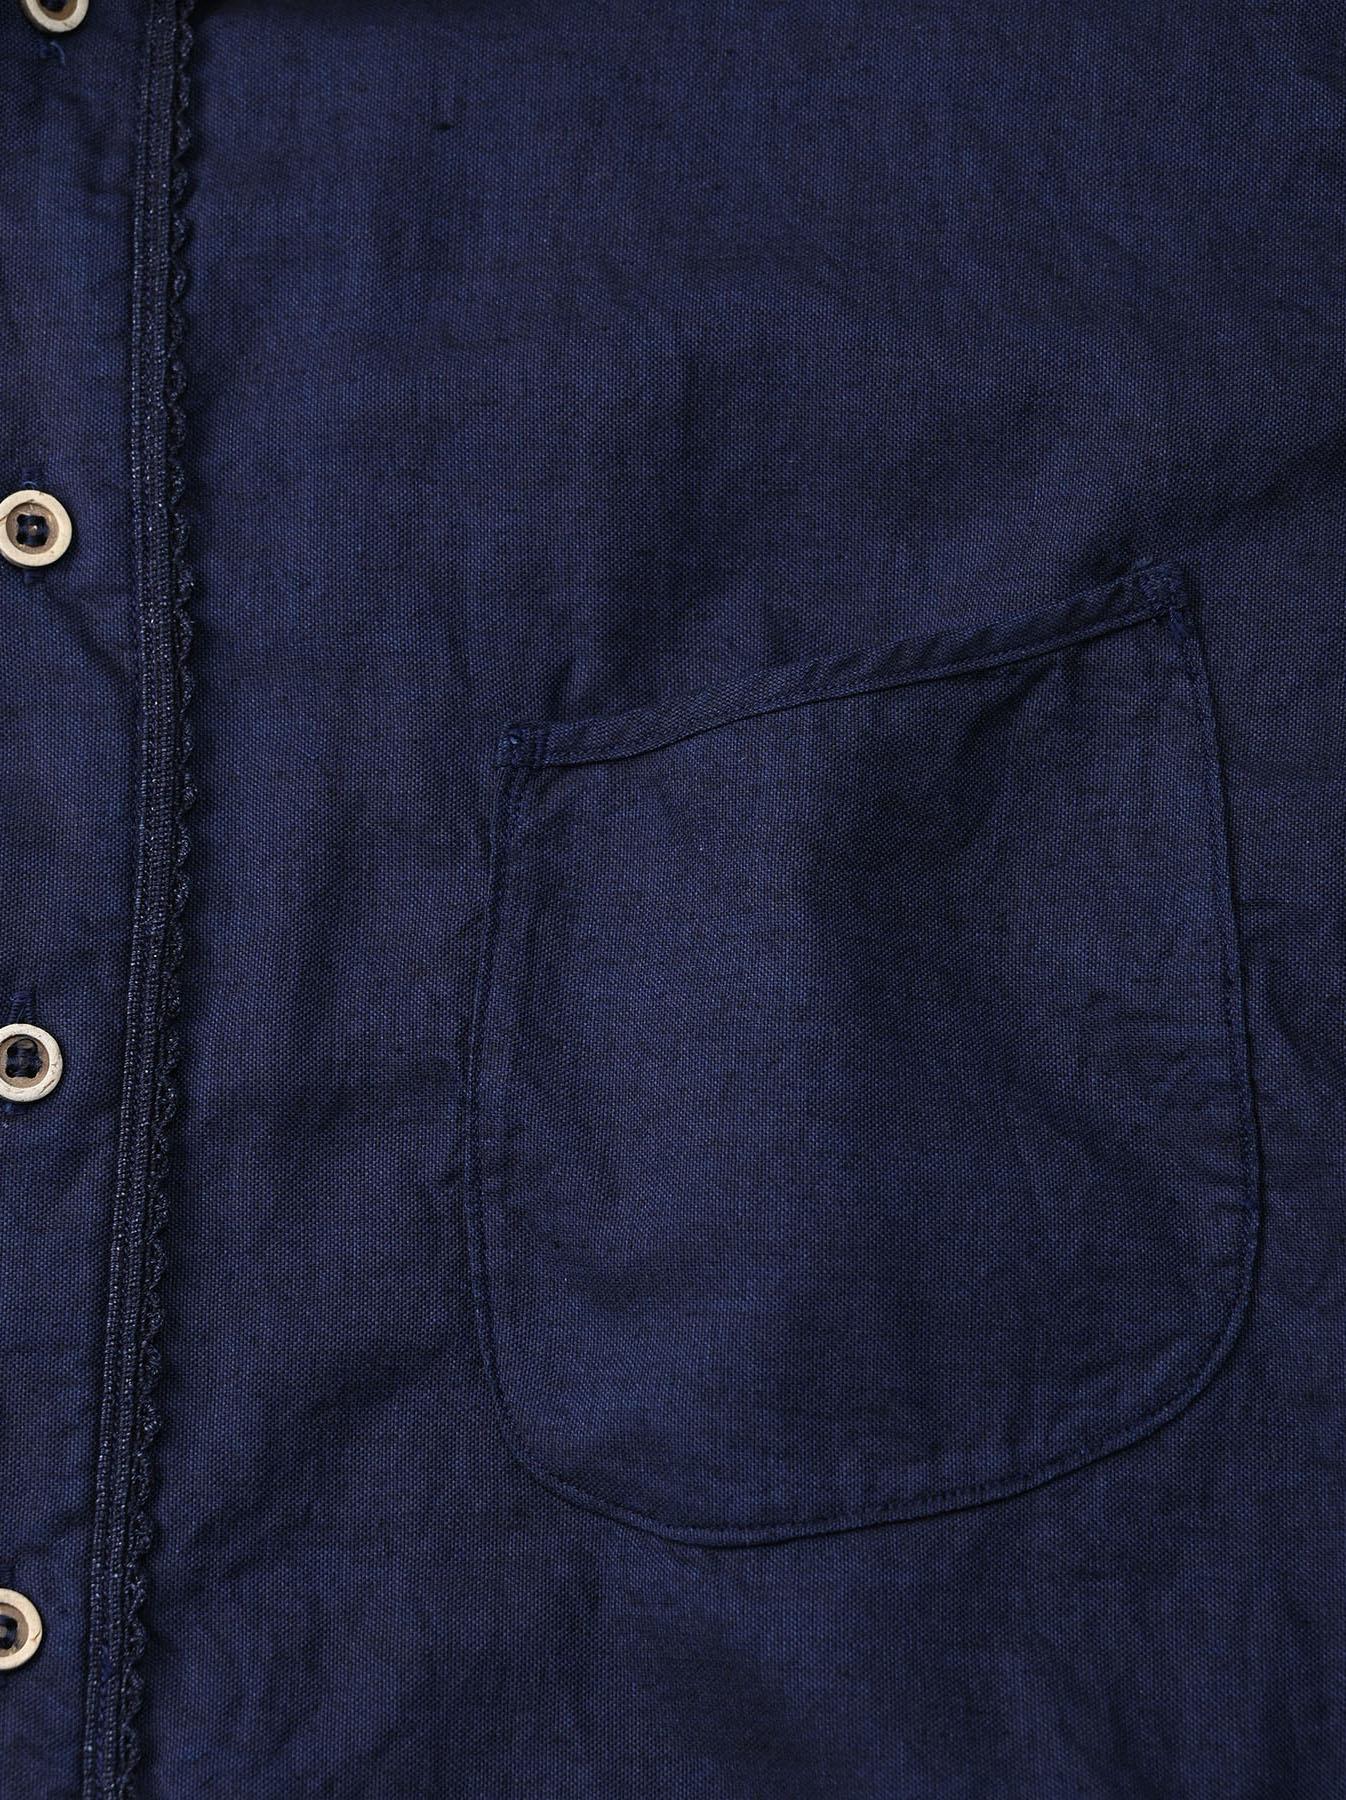 Indigo Thin Oxford 908 Ocean Lace Shirt (0621)-12